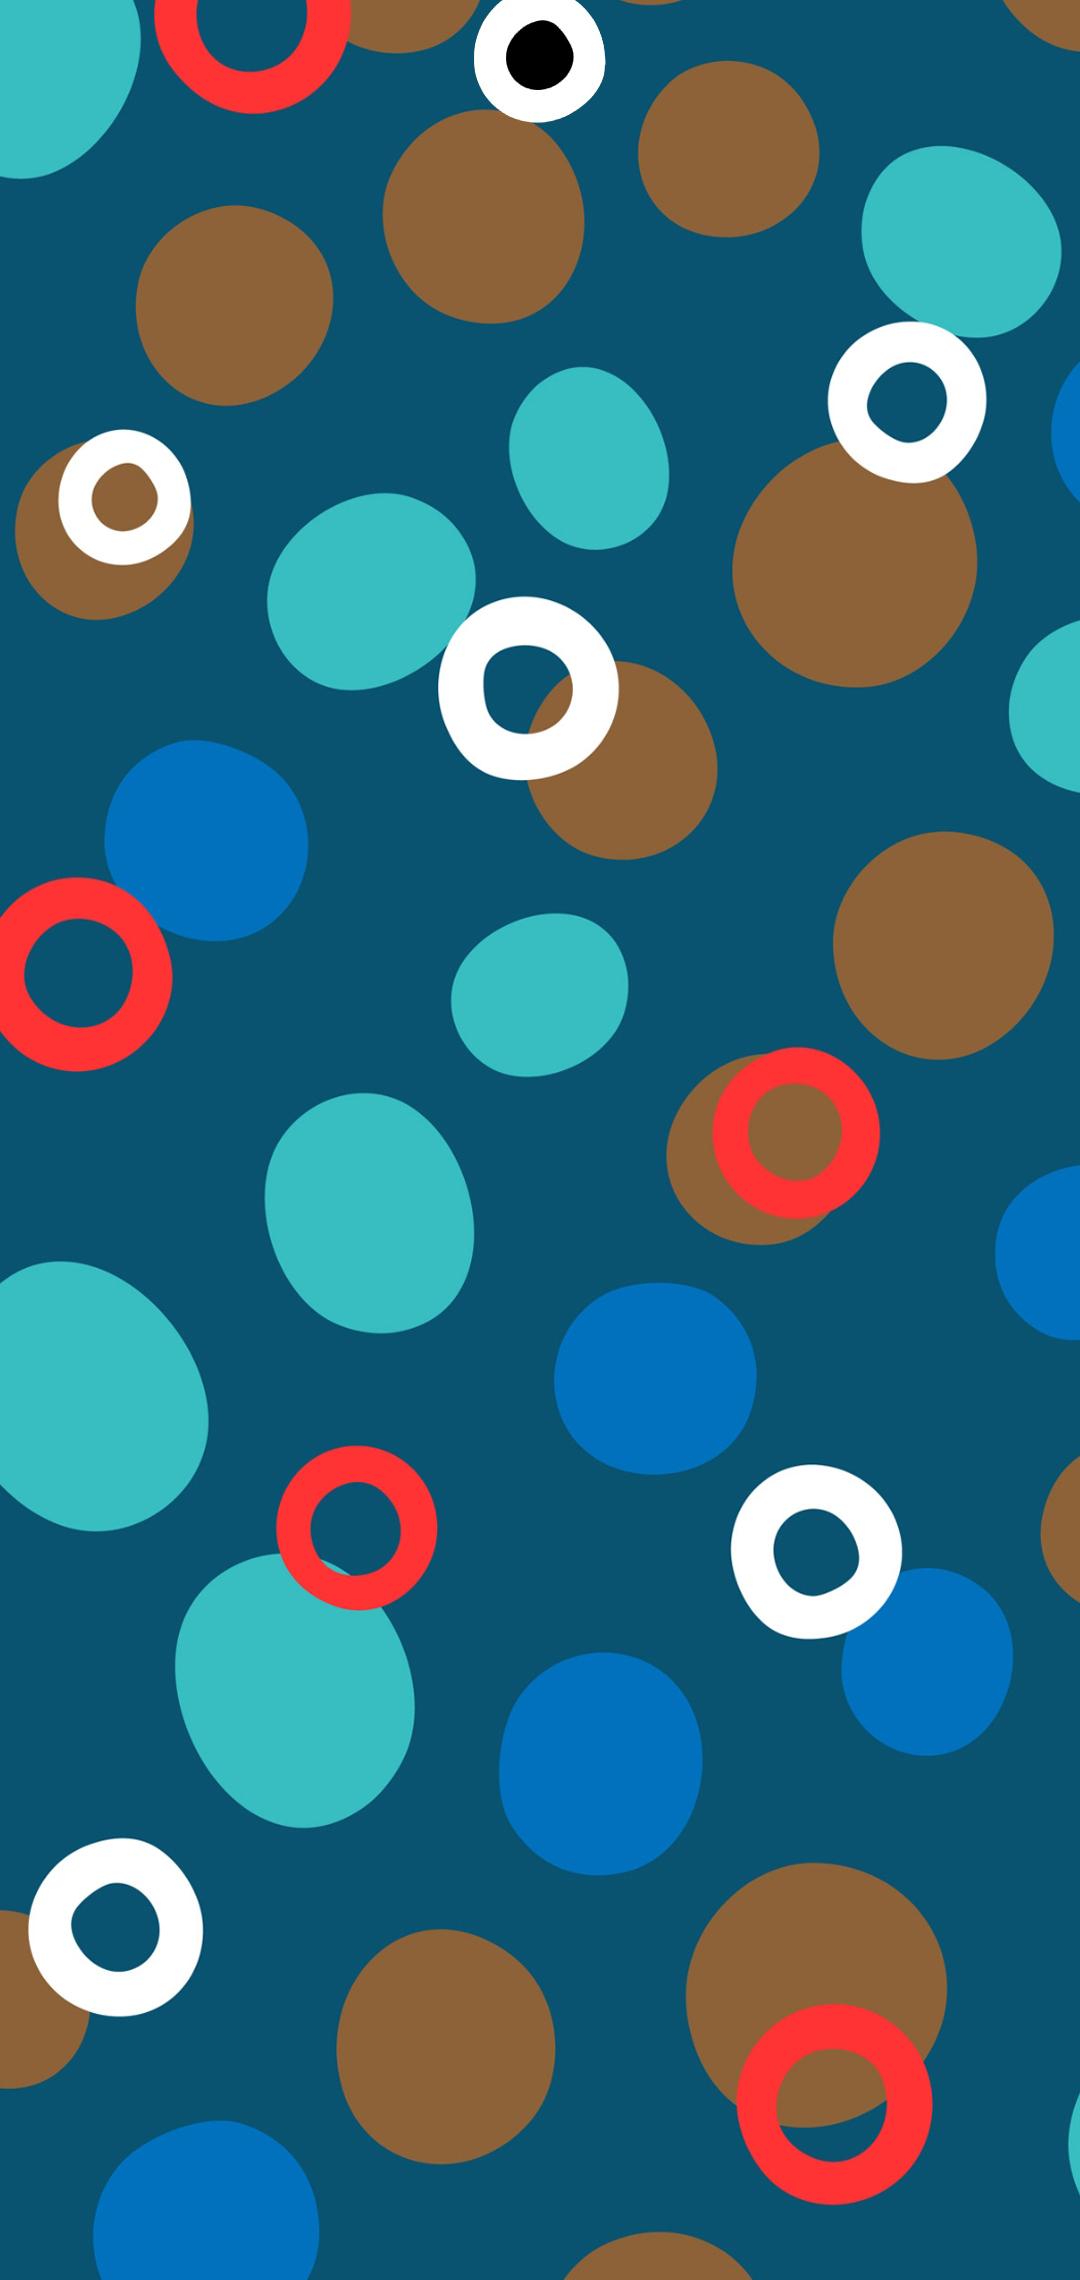 circle art hole-punch wallpaper